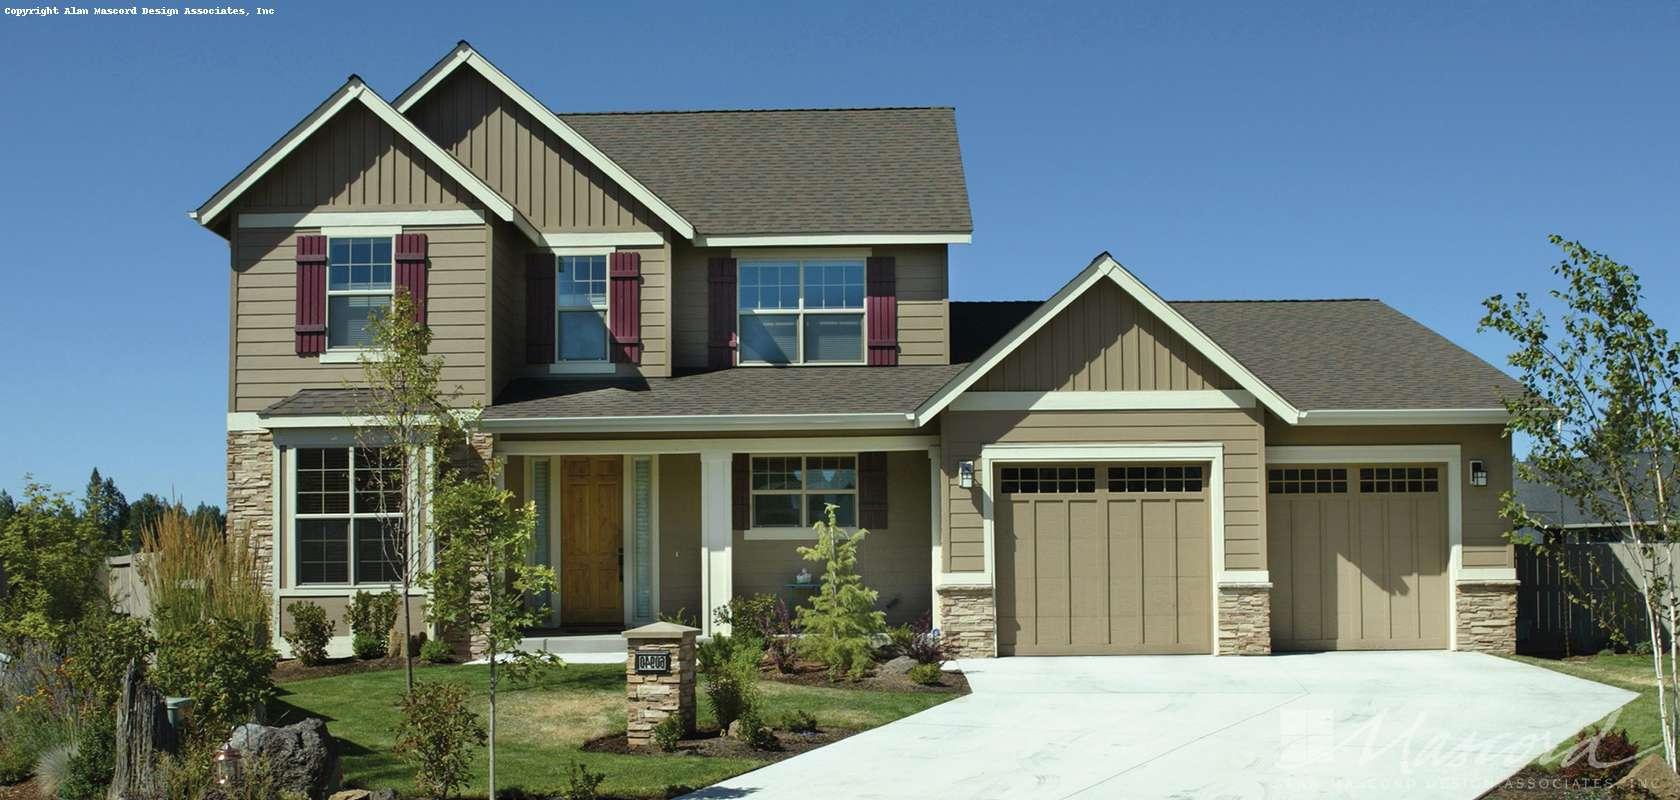 Mascord House Plan B22146A: The Dellwood